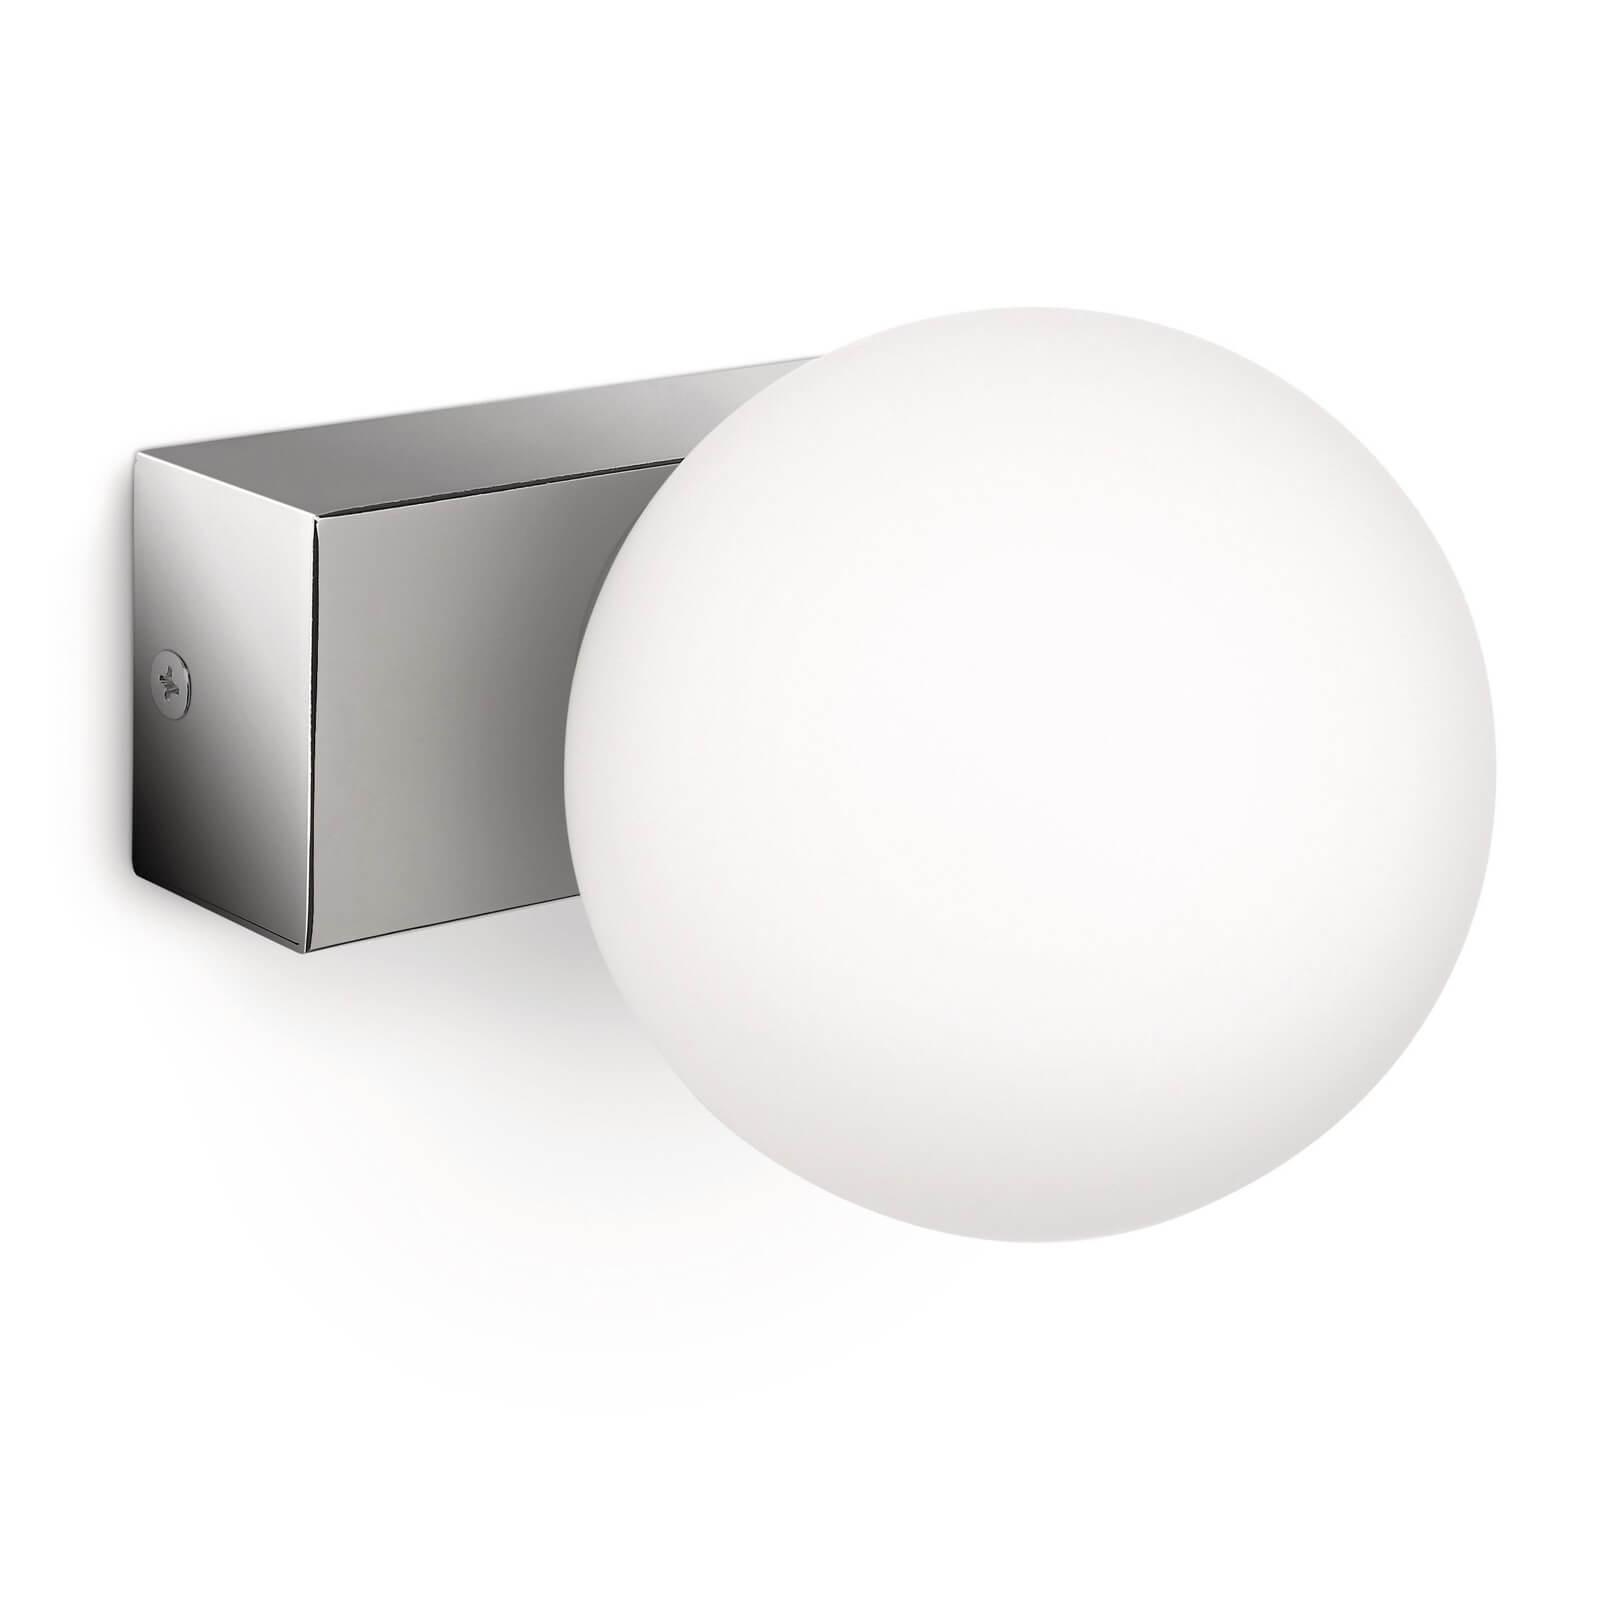 philips mybathroom drops wandlamp chroom wit 1 lamp. Black Bedroom Furniture Sets. Home Design Ideas